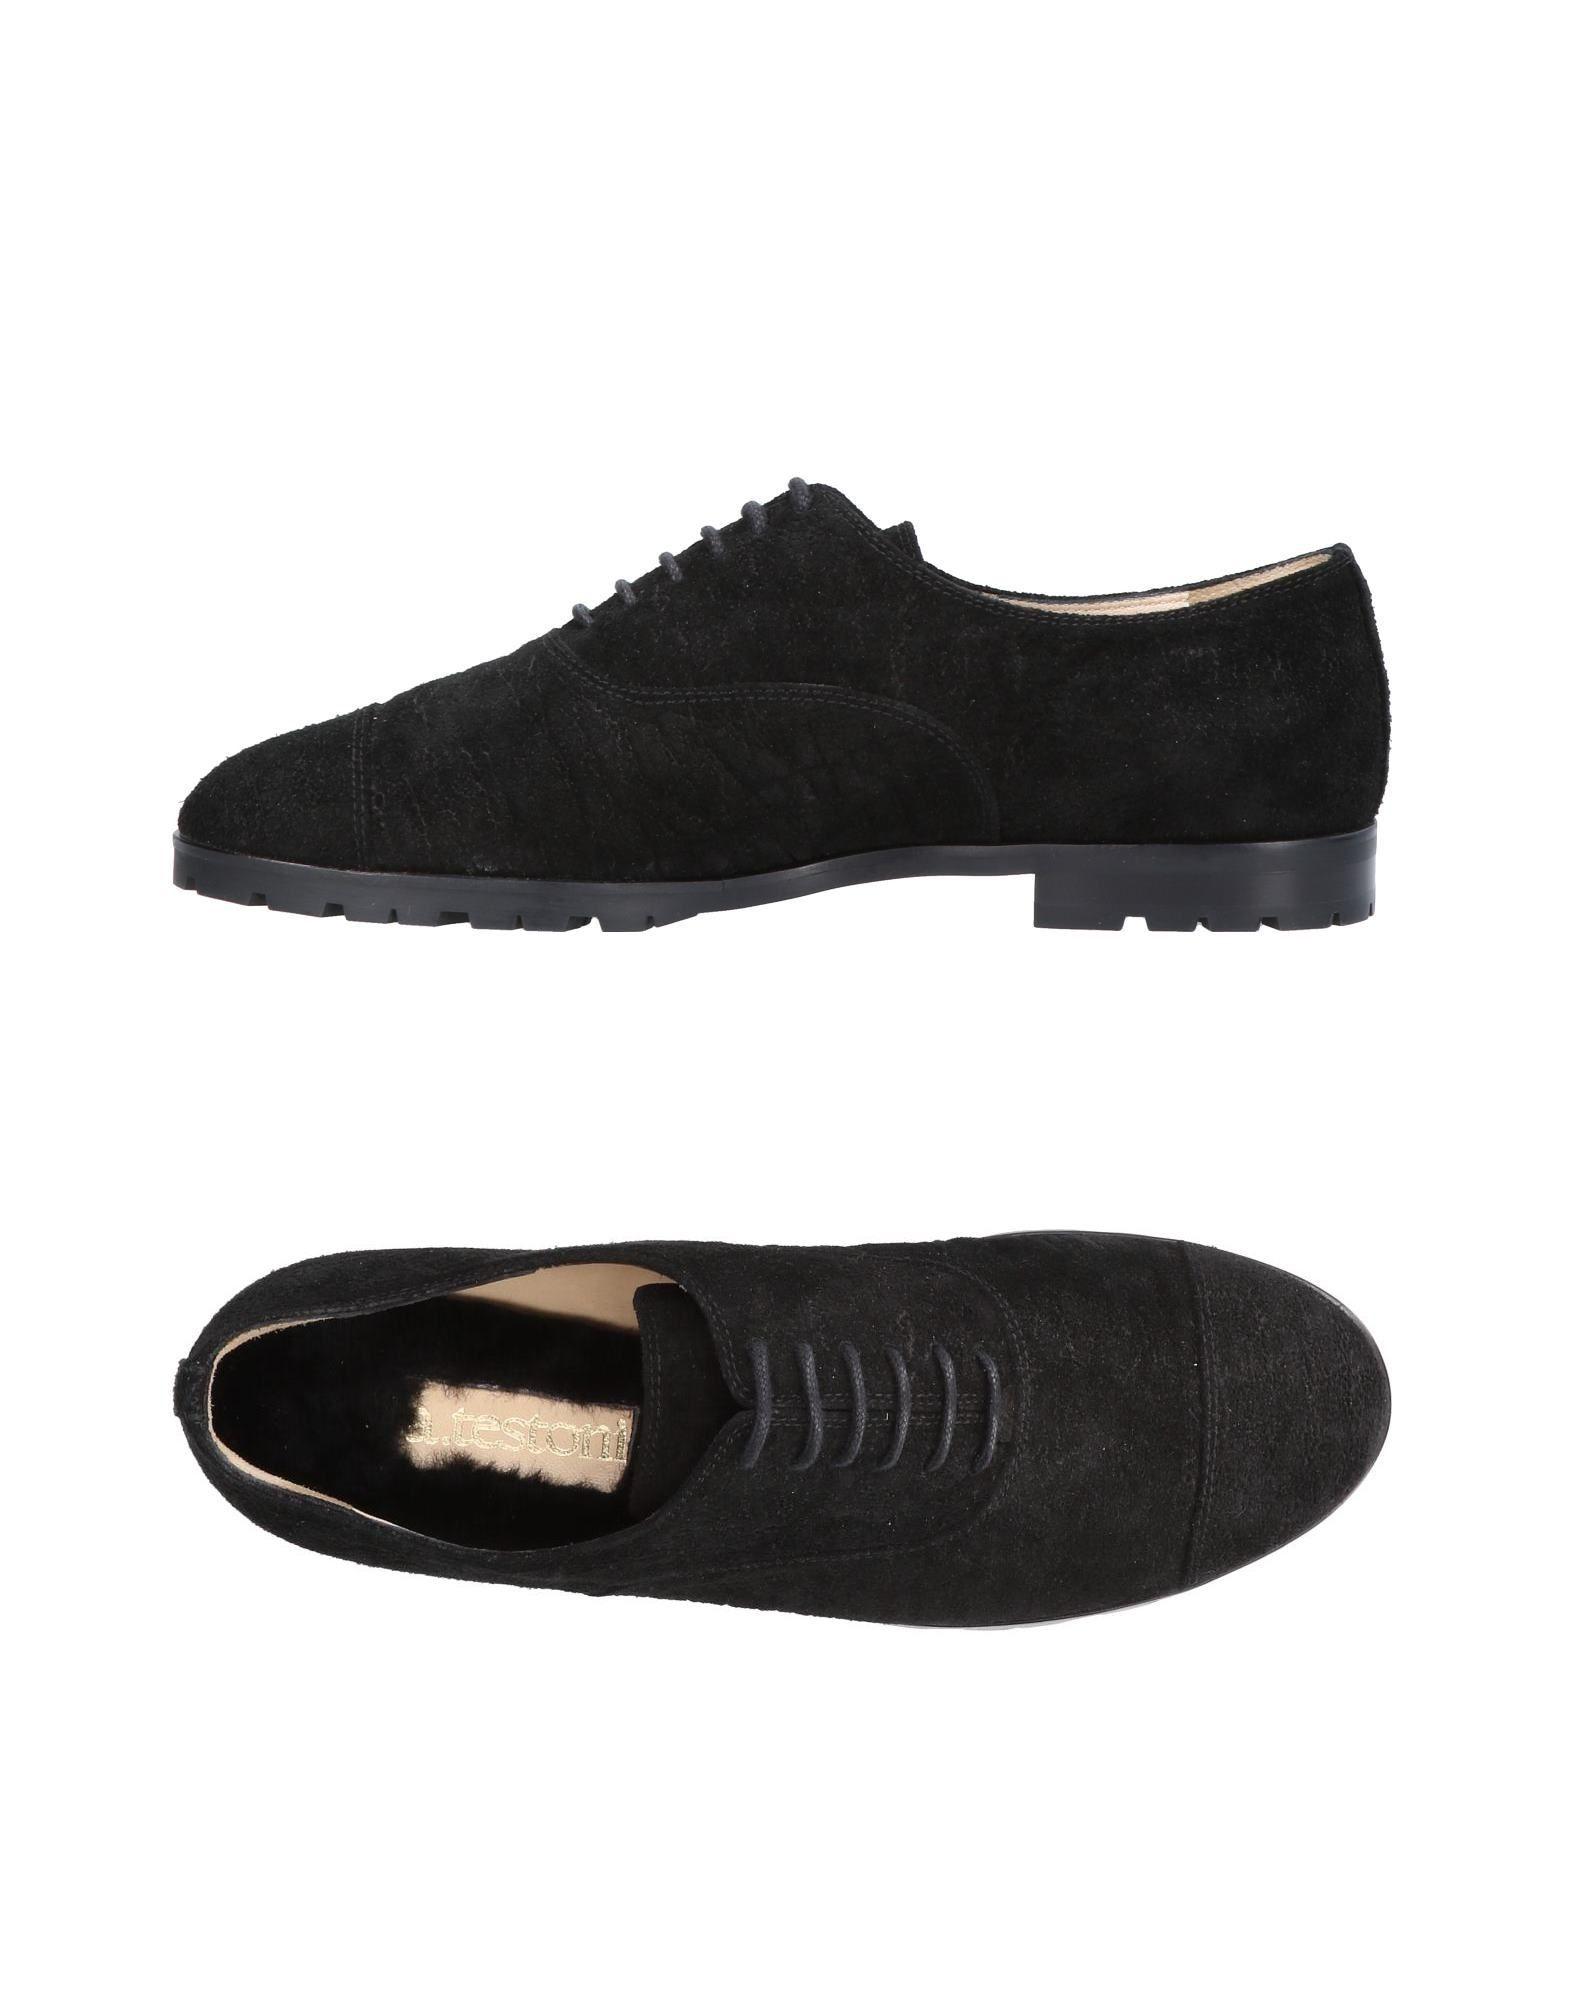 A.TESTONI Обувь на шнурках обувь 2015 тренды